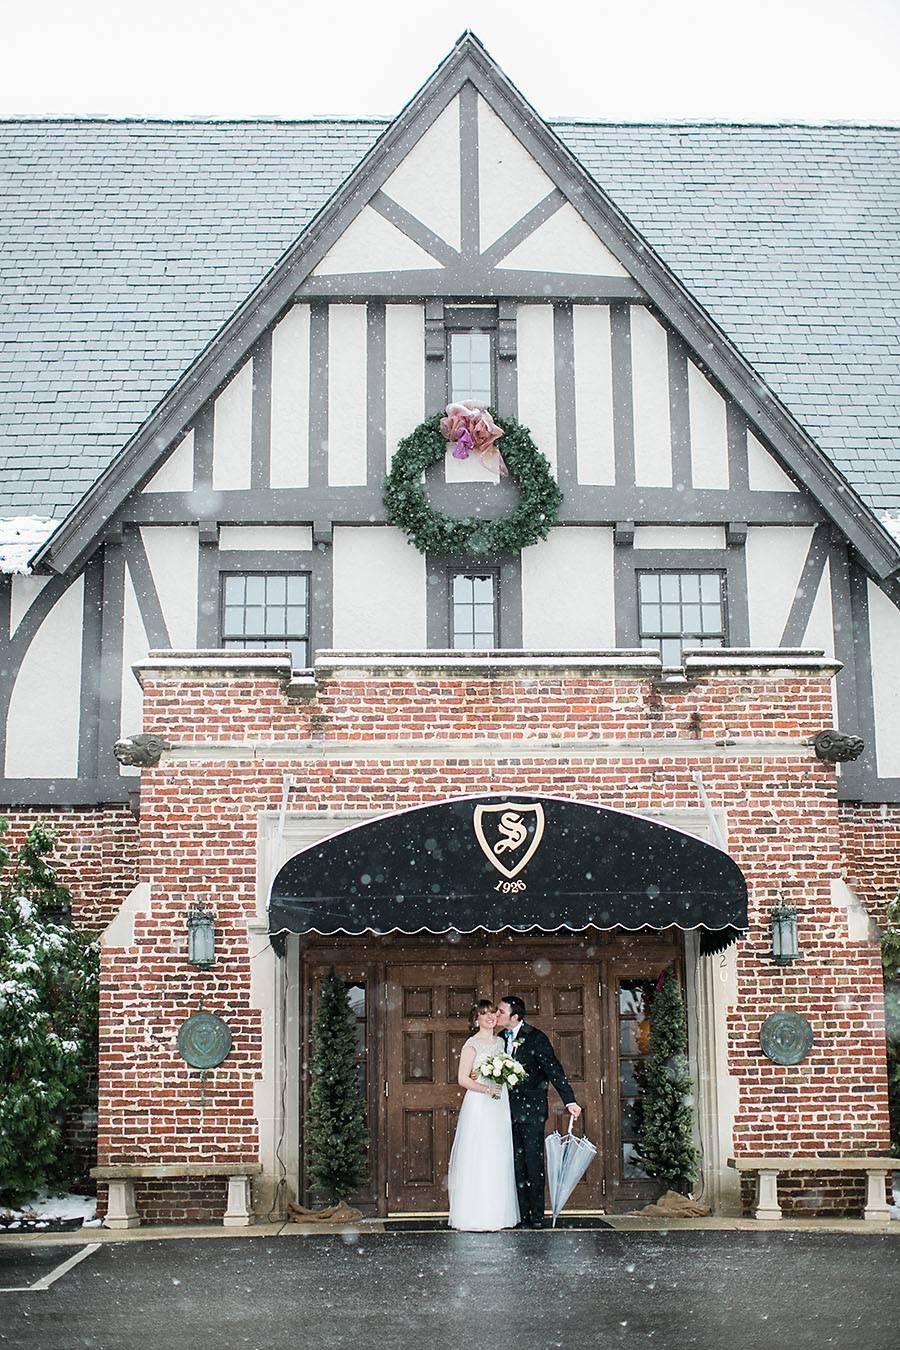 Weddings at Sedgefield Country Club | Eric Boneske Photography ...